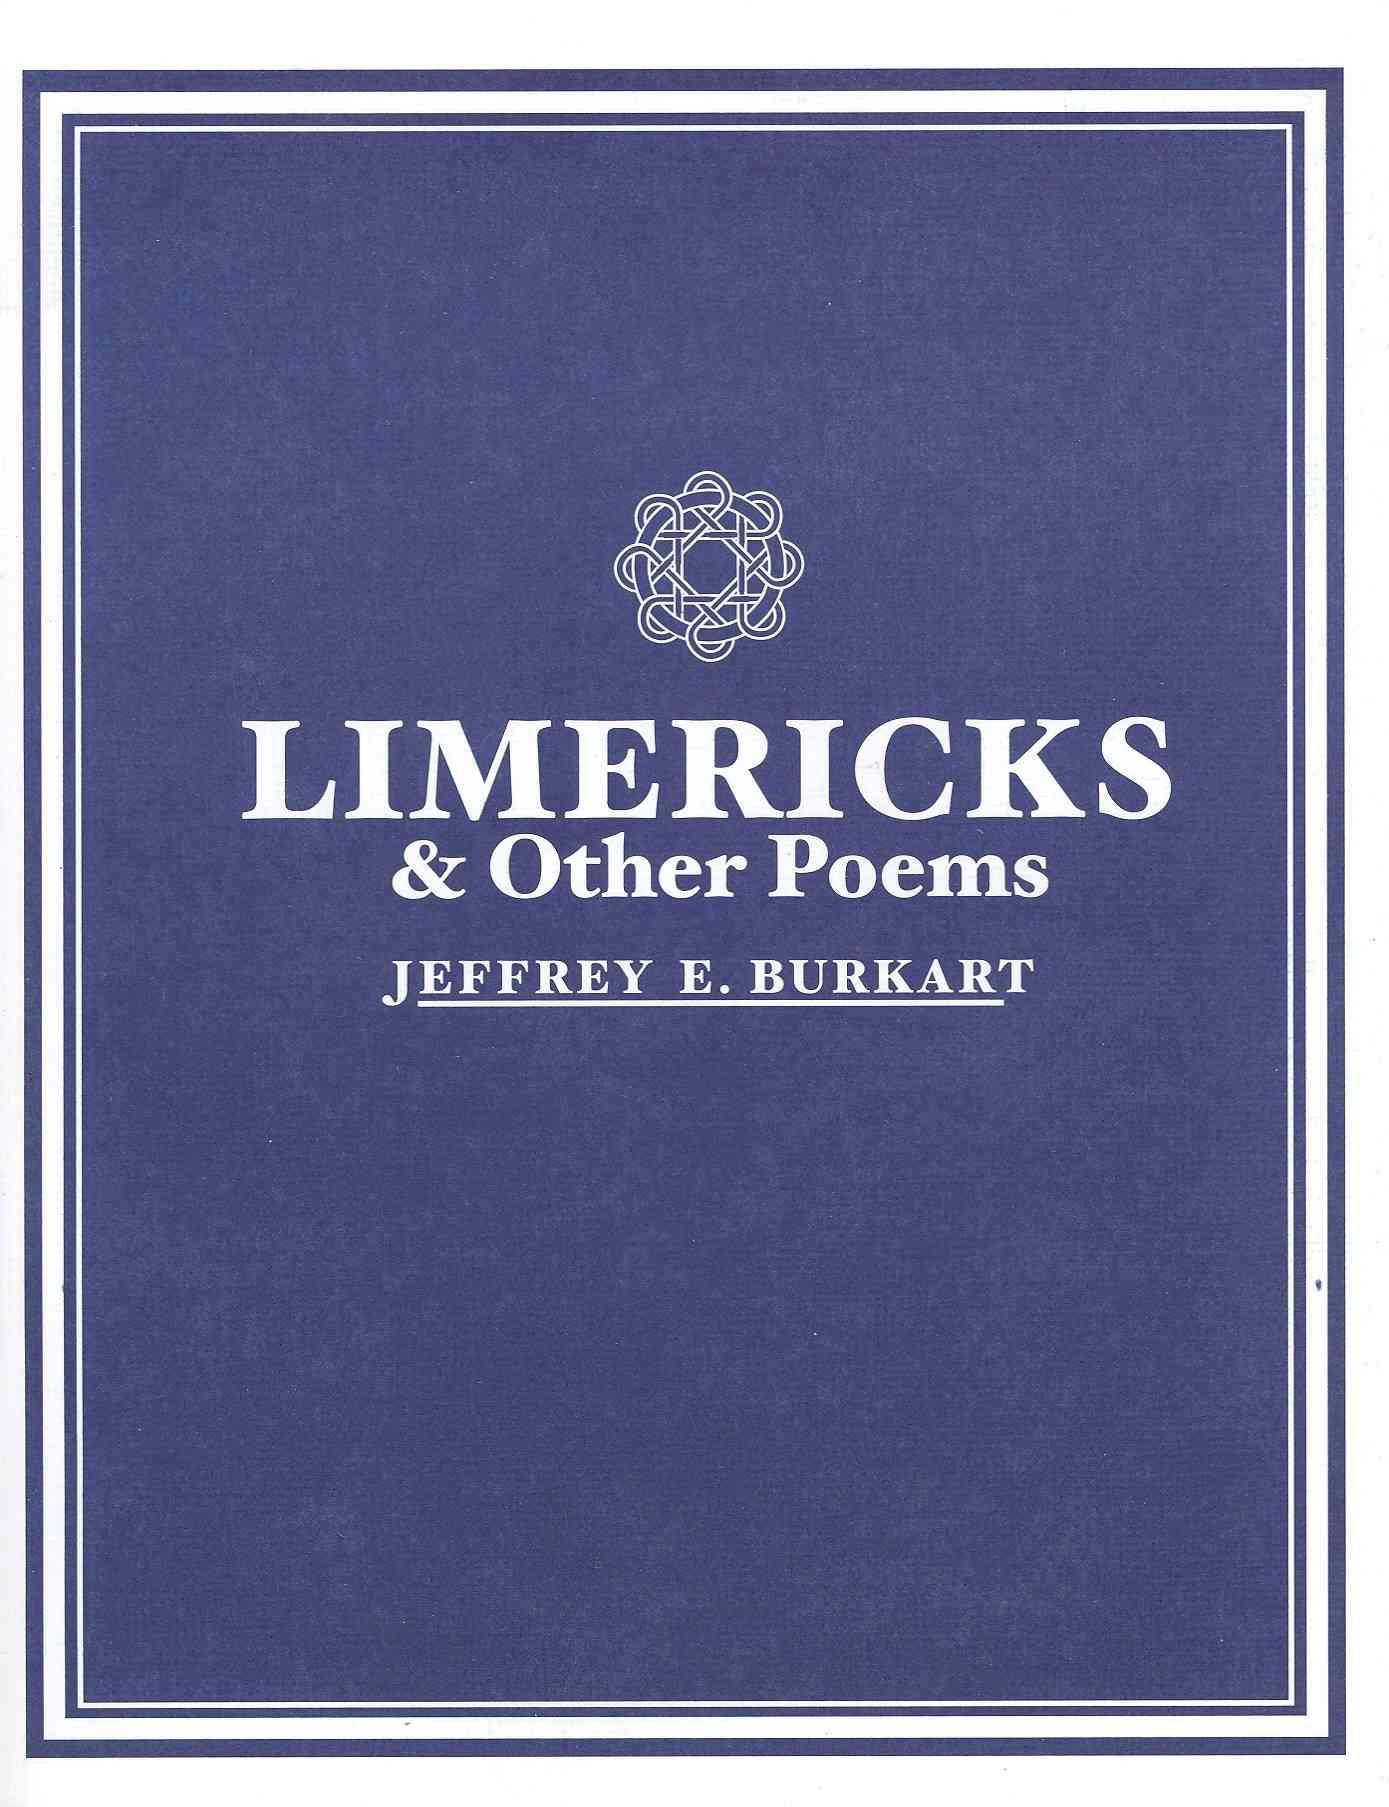 Limericks & Other Poems(Paperback / softback)